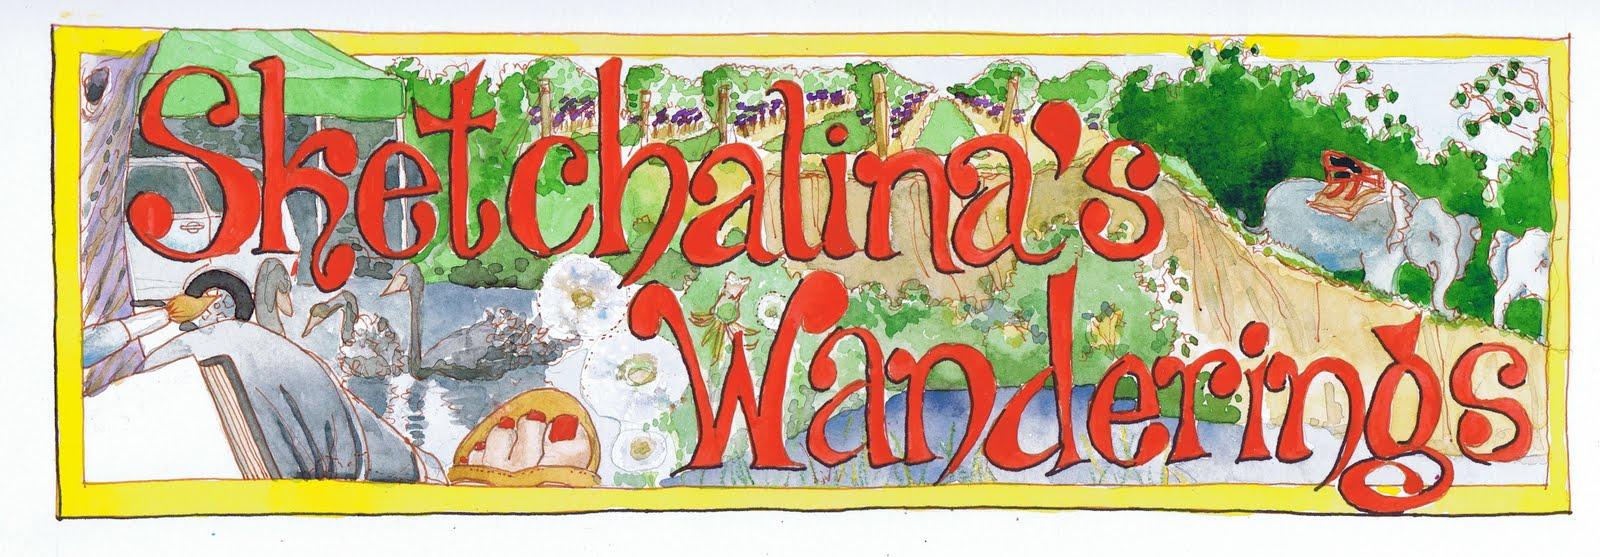 Sketchalina's Wanderings